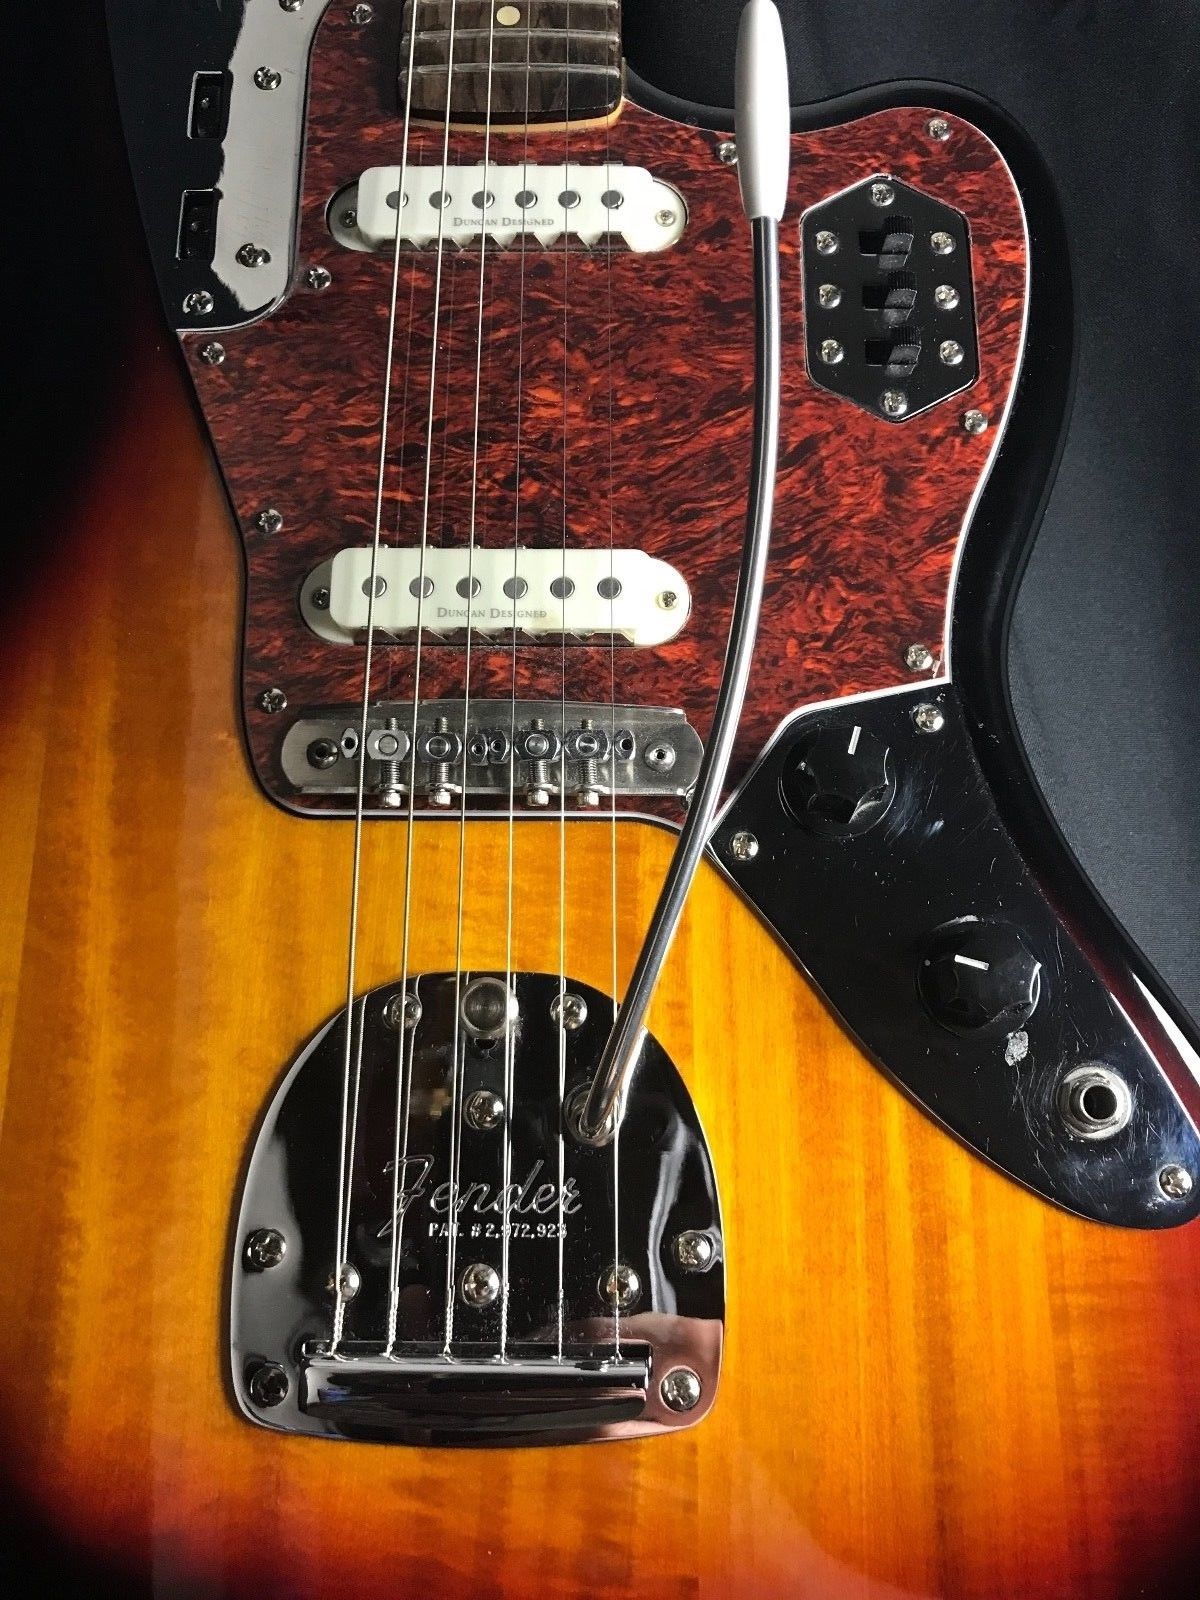 fender guitars storybook jaguar description sunburst guitar thumb